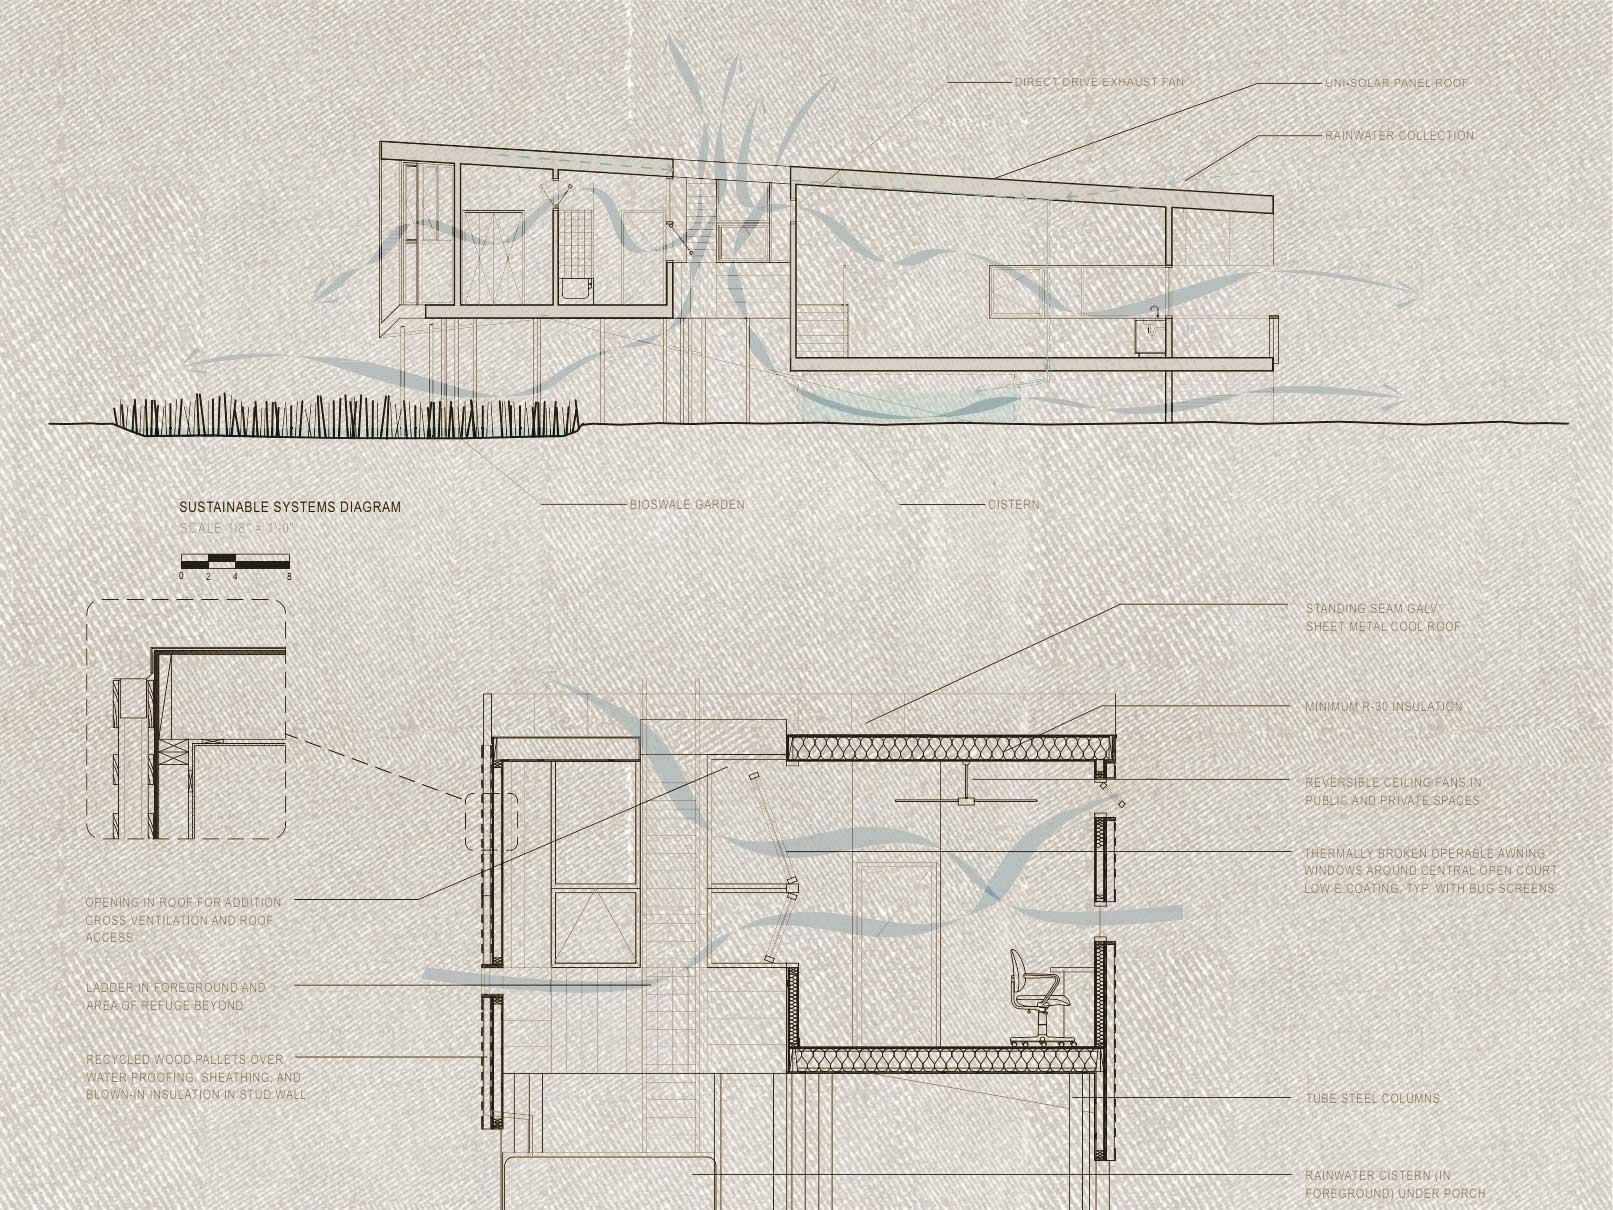 28 planos de casas ecol gicas para dise ar viviendas ovacen